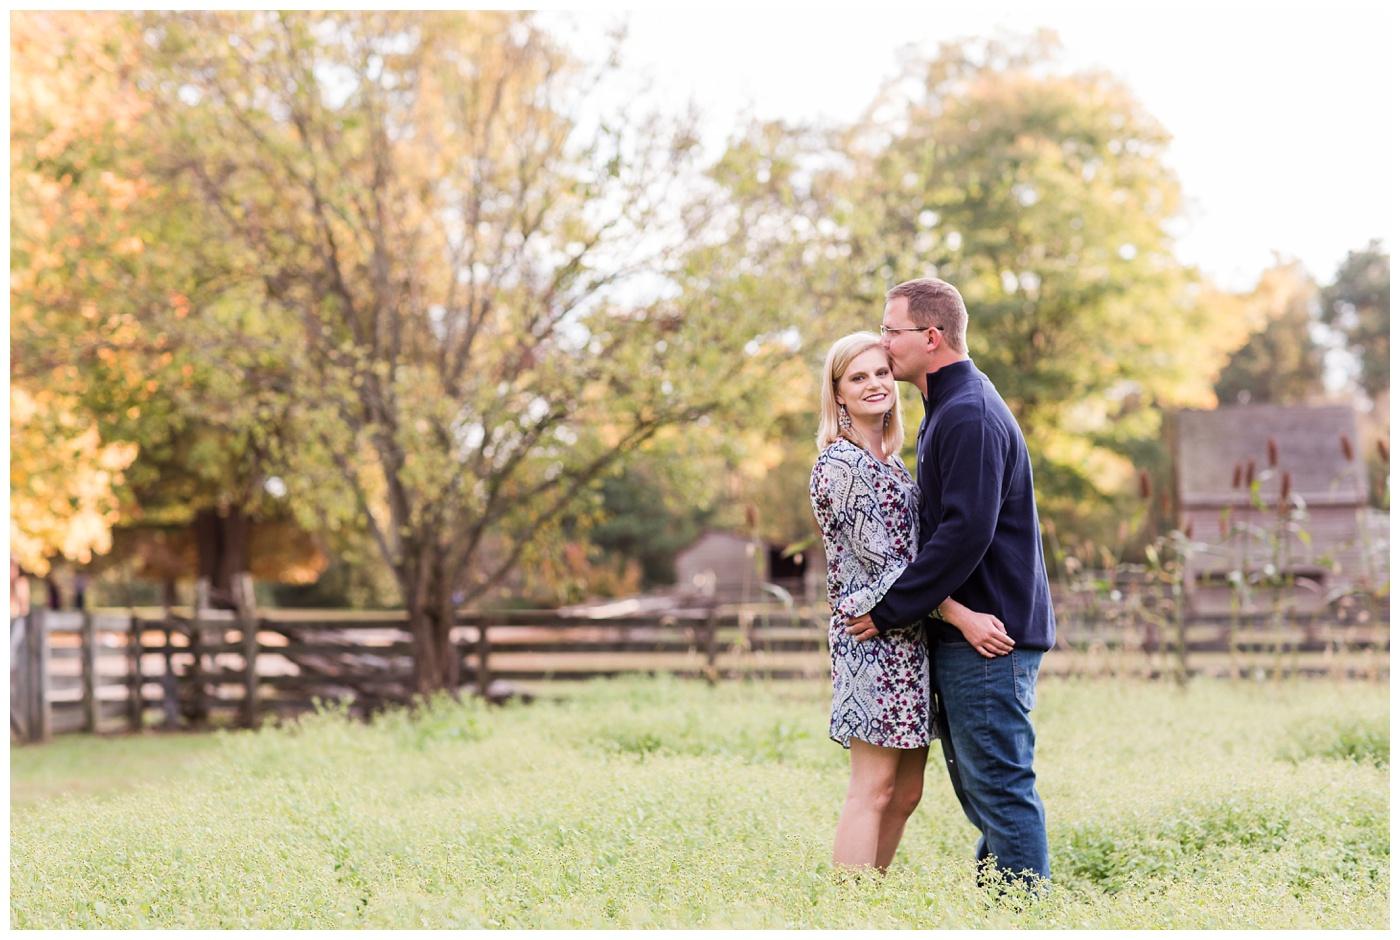 Natalie & Bobby | Meadow Farm Park Engagement session